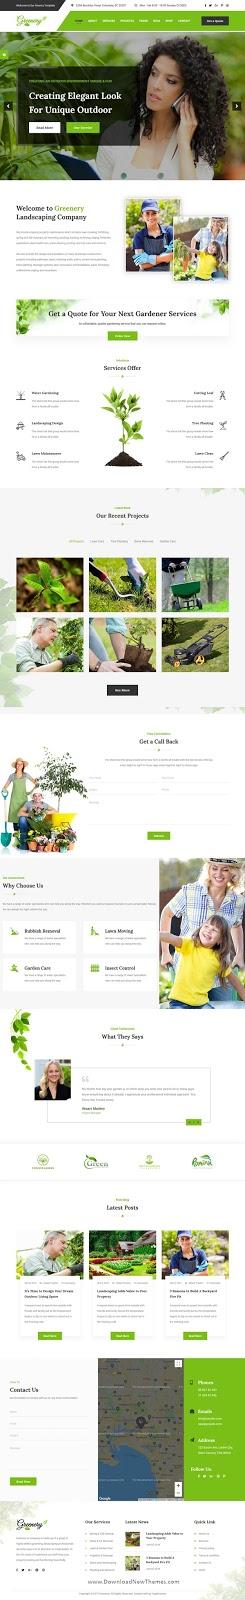 Premium Gardening, Lawn & Landscaping HTML Template